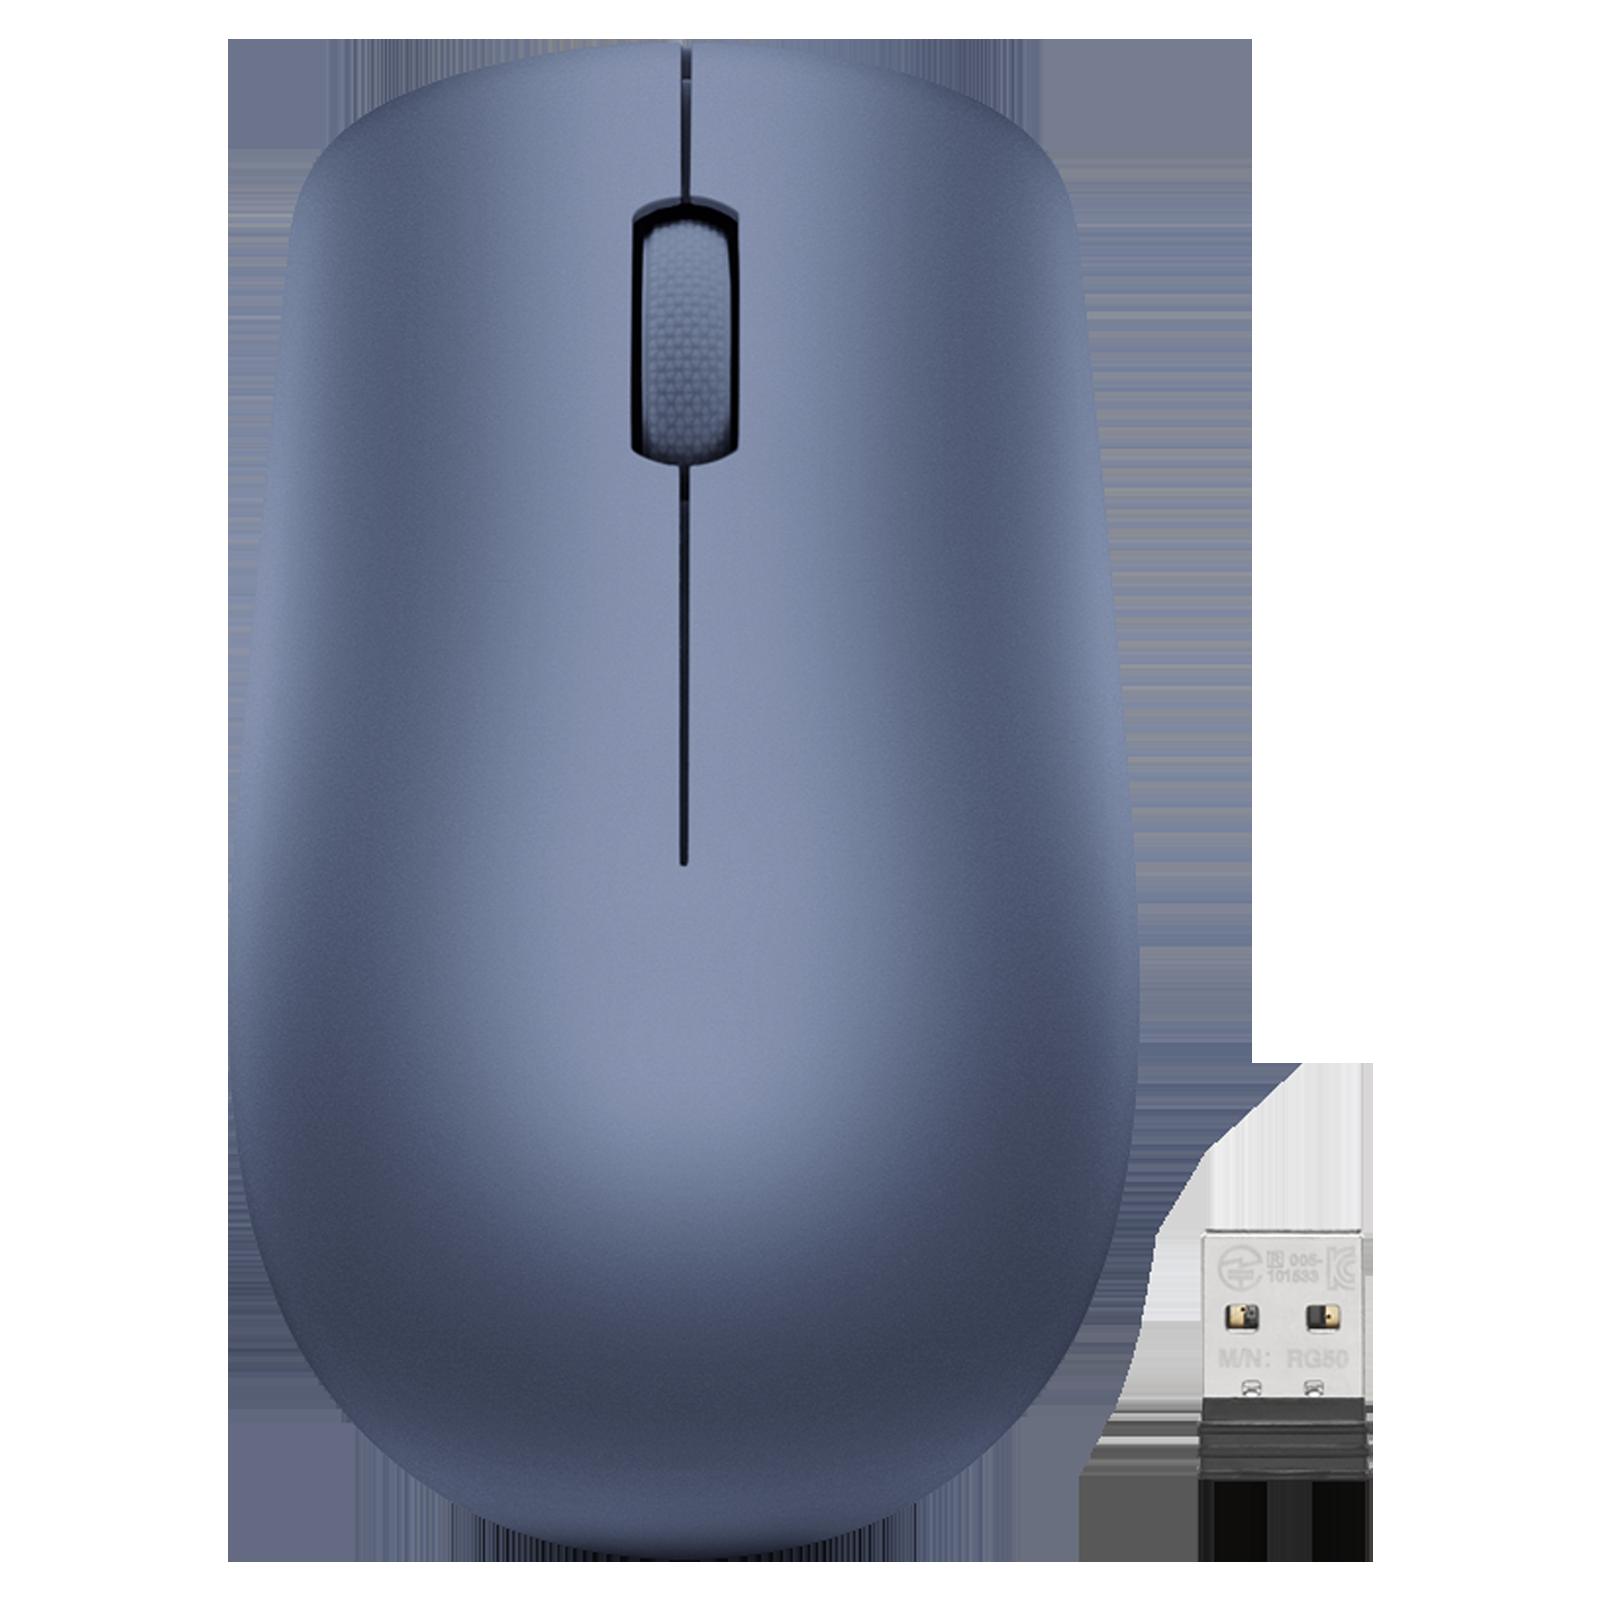 Lenovo 530 Wireless Optical Mouse (Up to 8 Million Clicks, GY50Z18986, Blue)_1